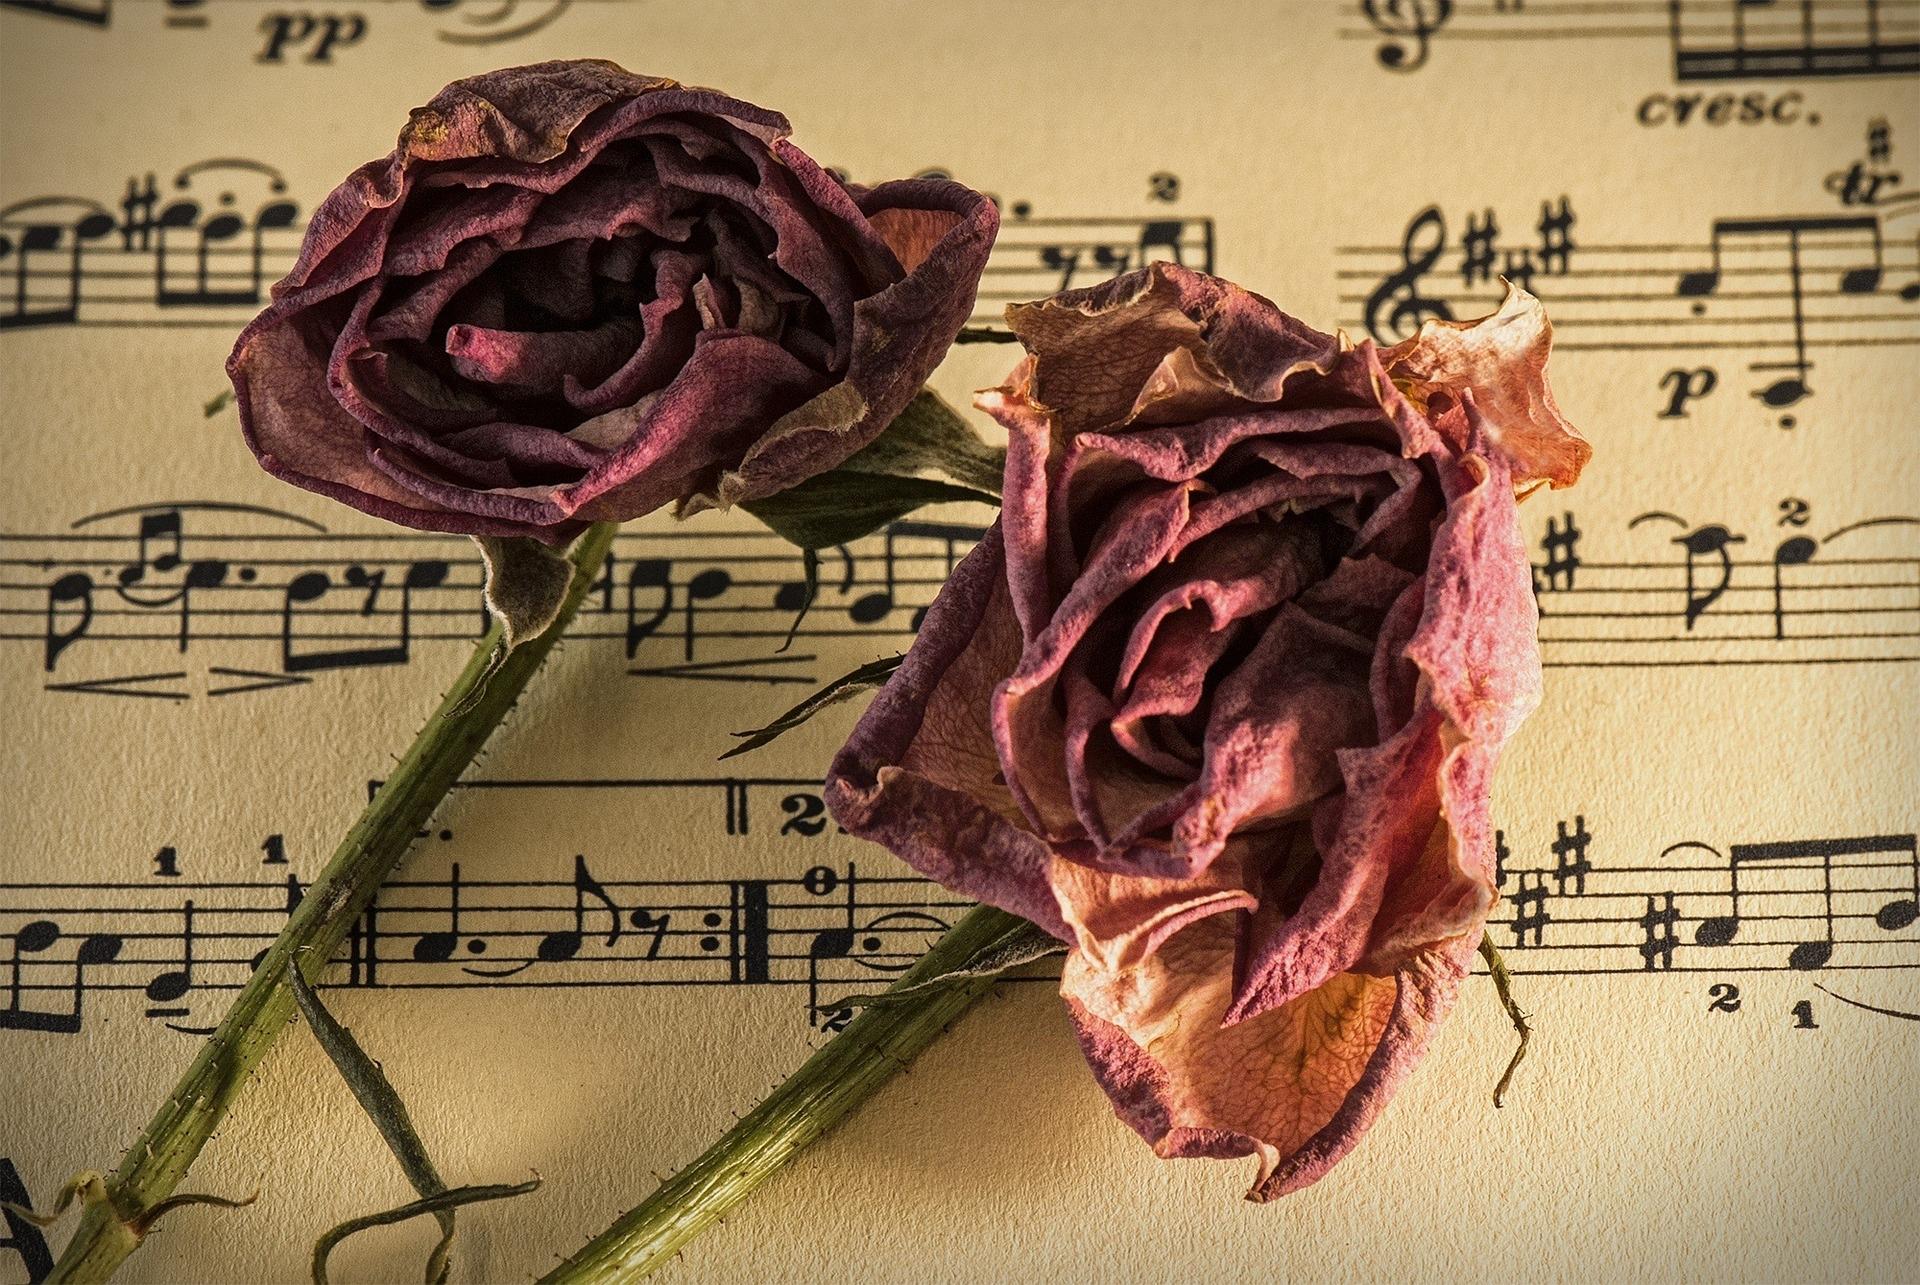 sheet-music-944796_1920.jpg